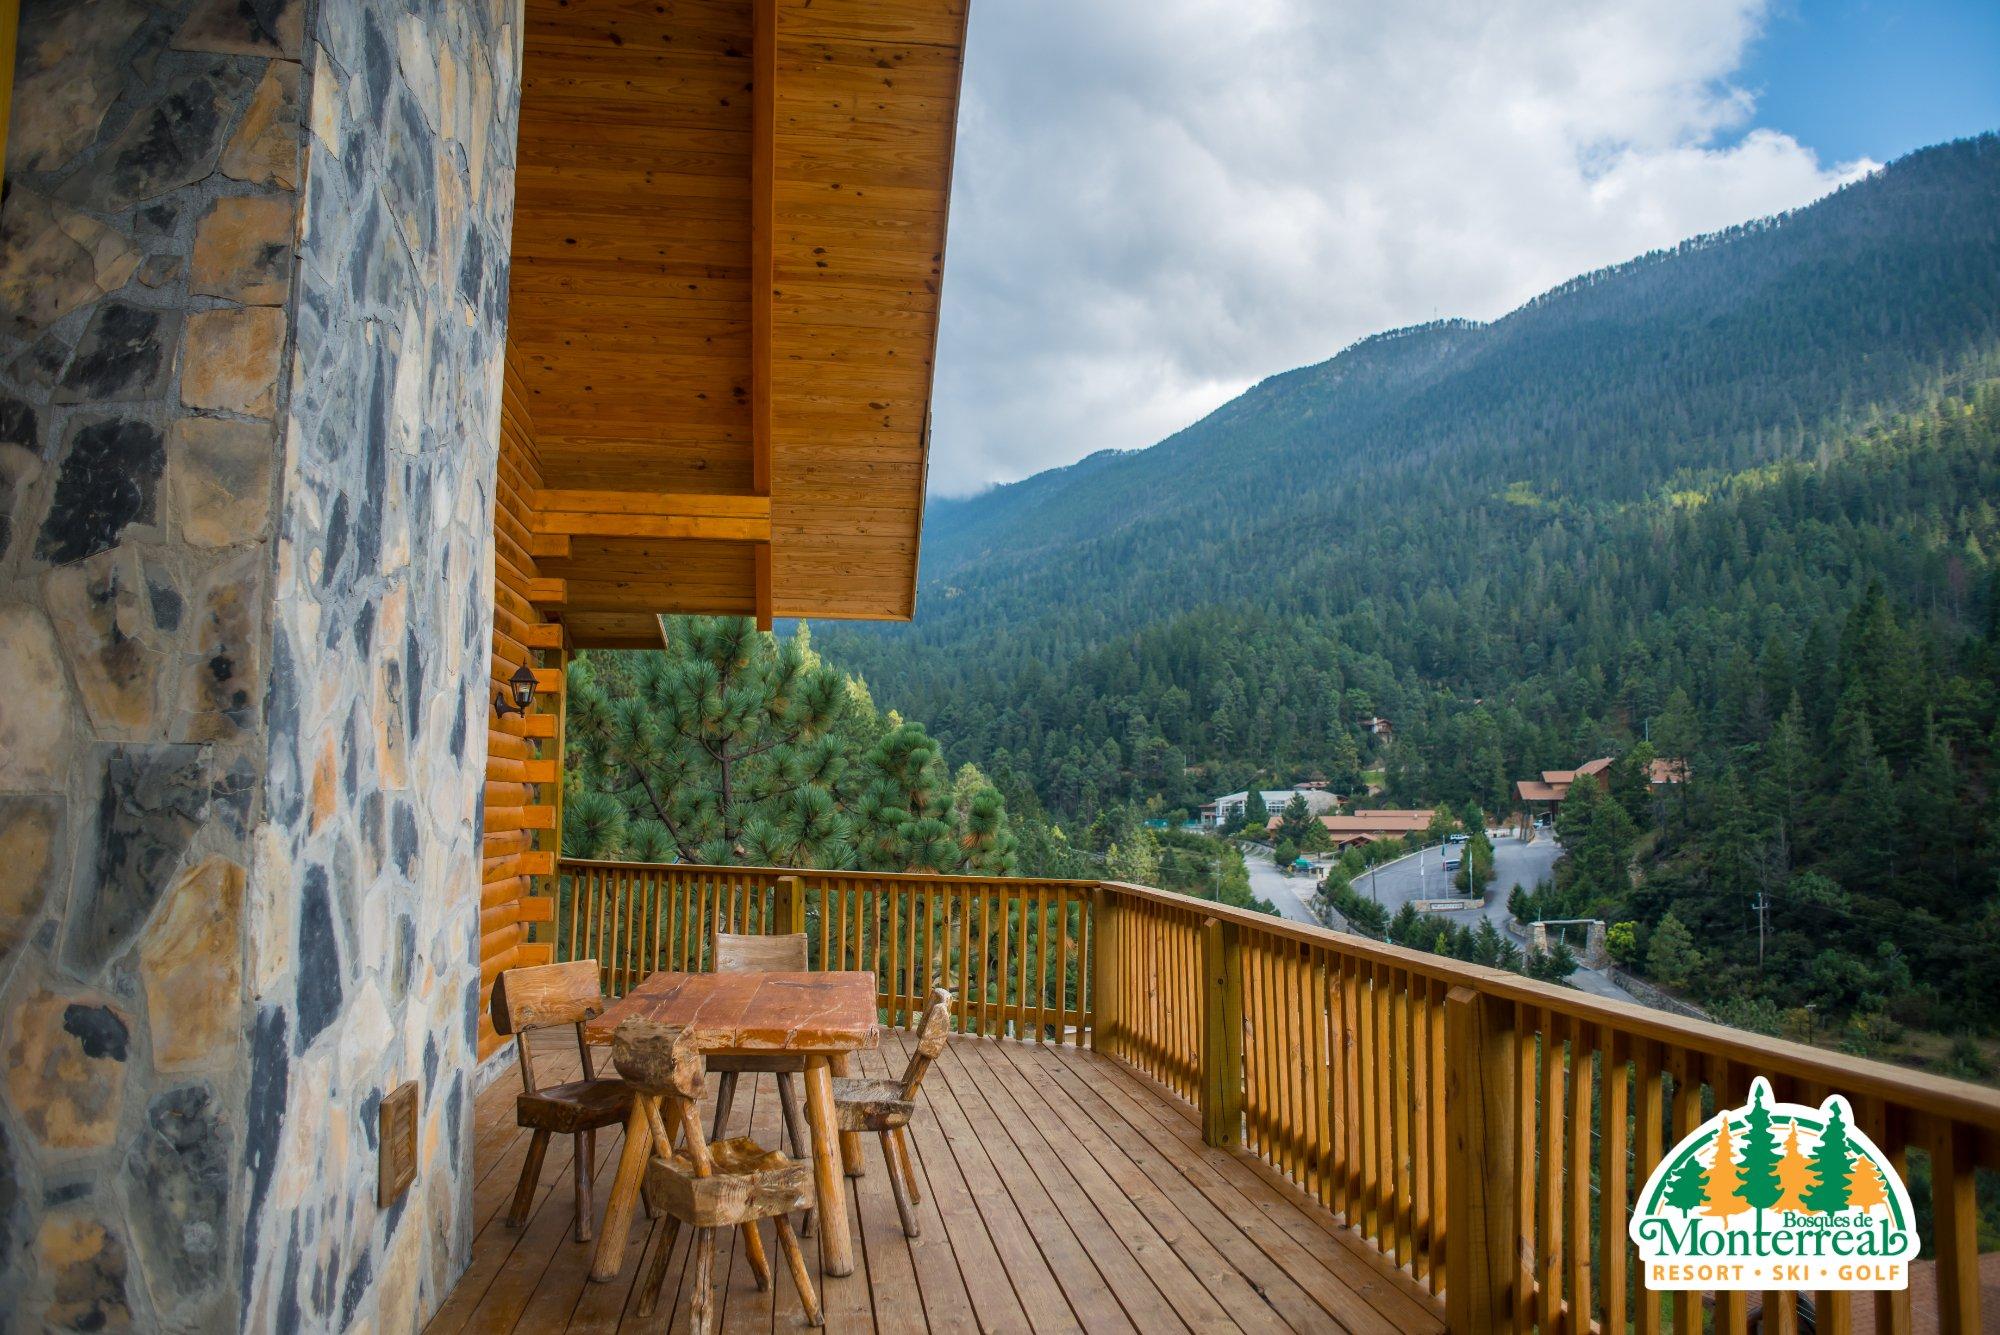 Bosques de Monterreal Resort Ski and Golf